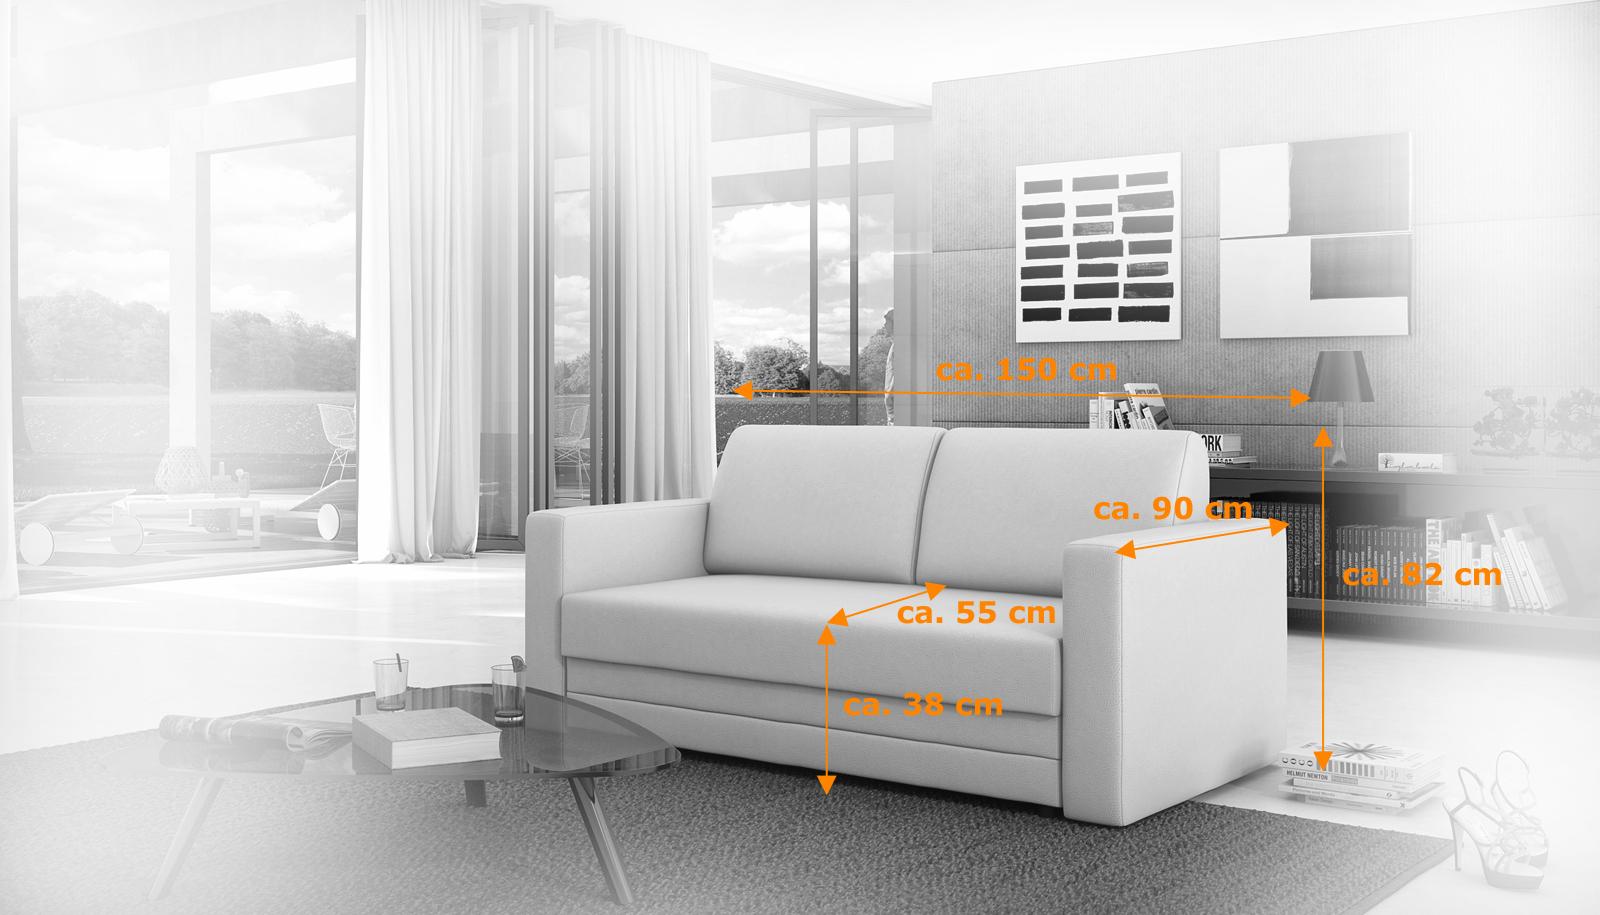 Sam schlafsofa wei sofa carmelita 150 cm bestellware for Schlafsofa 0 finanzierung